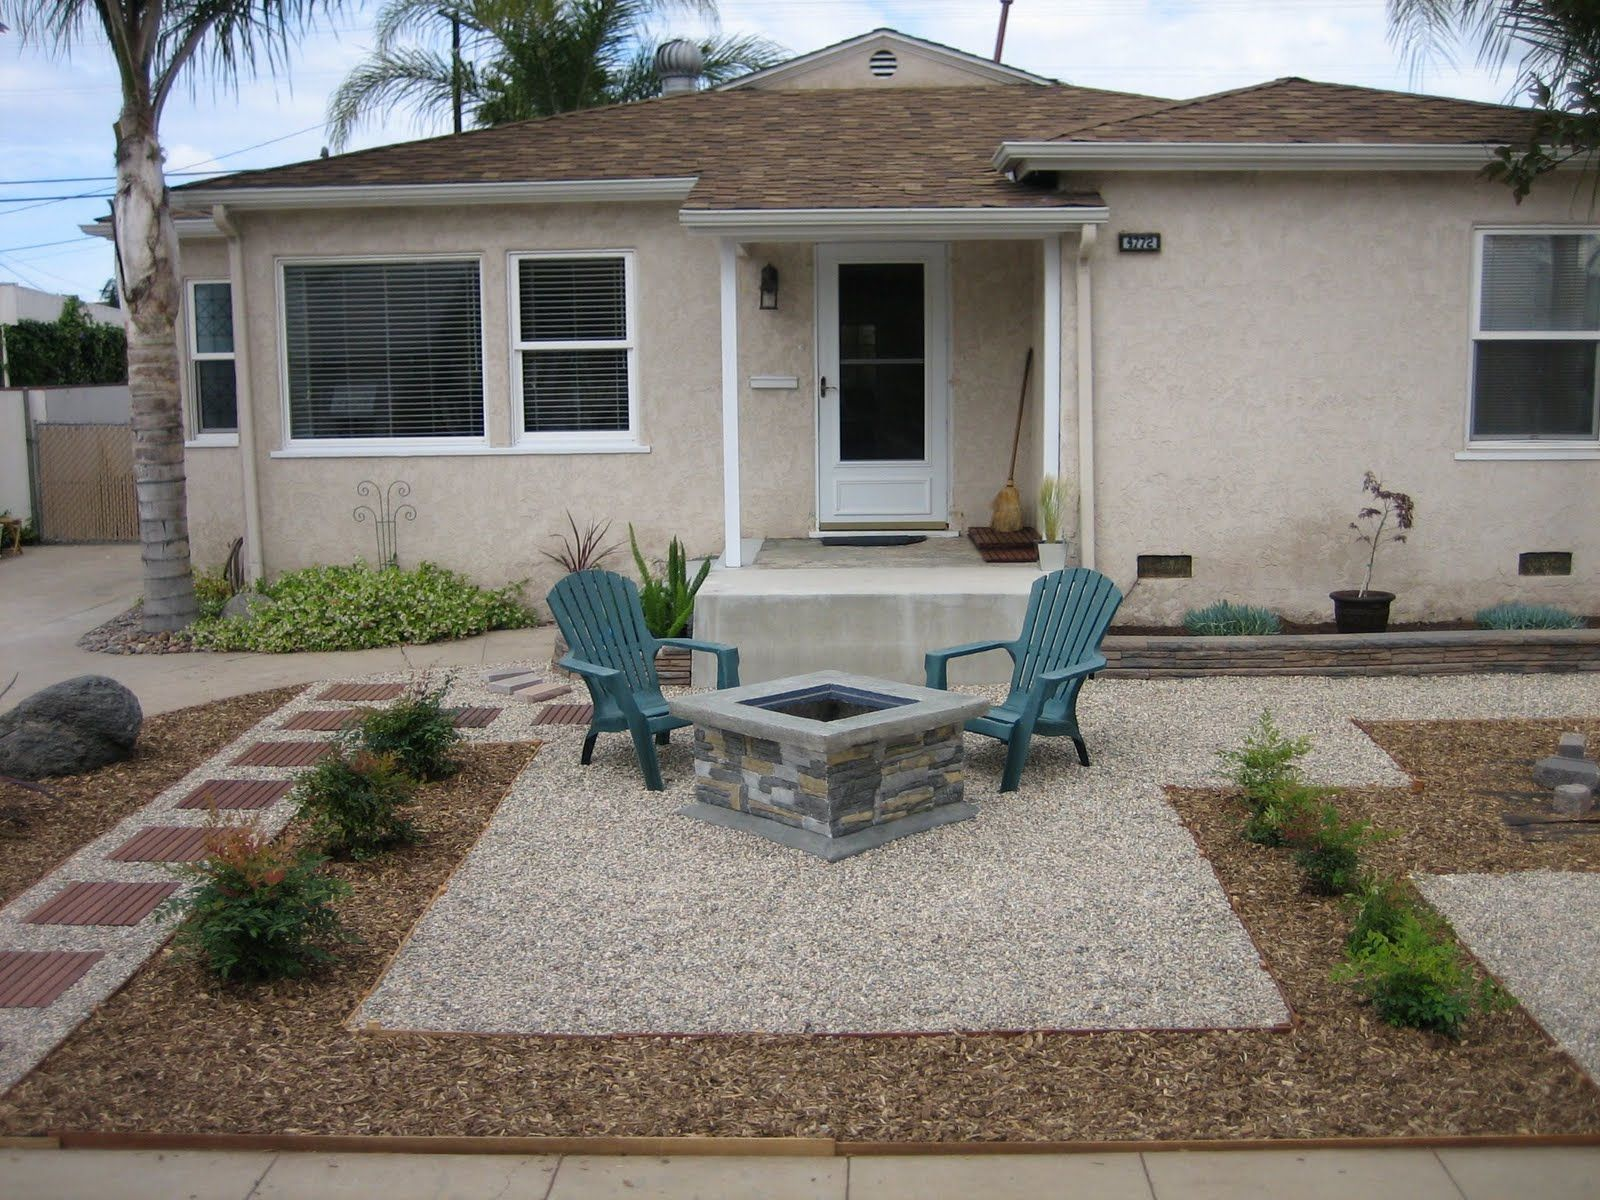 dedign yard with pea gravel